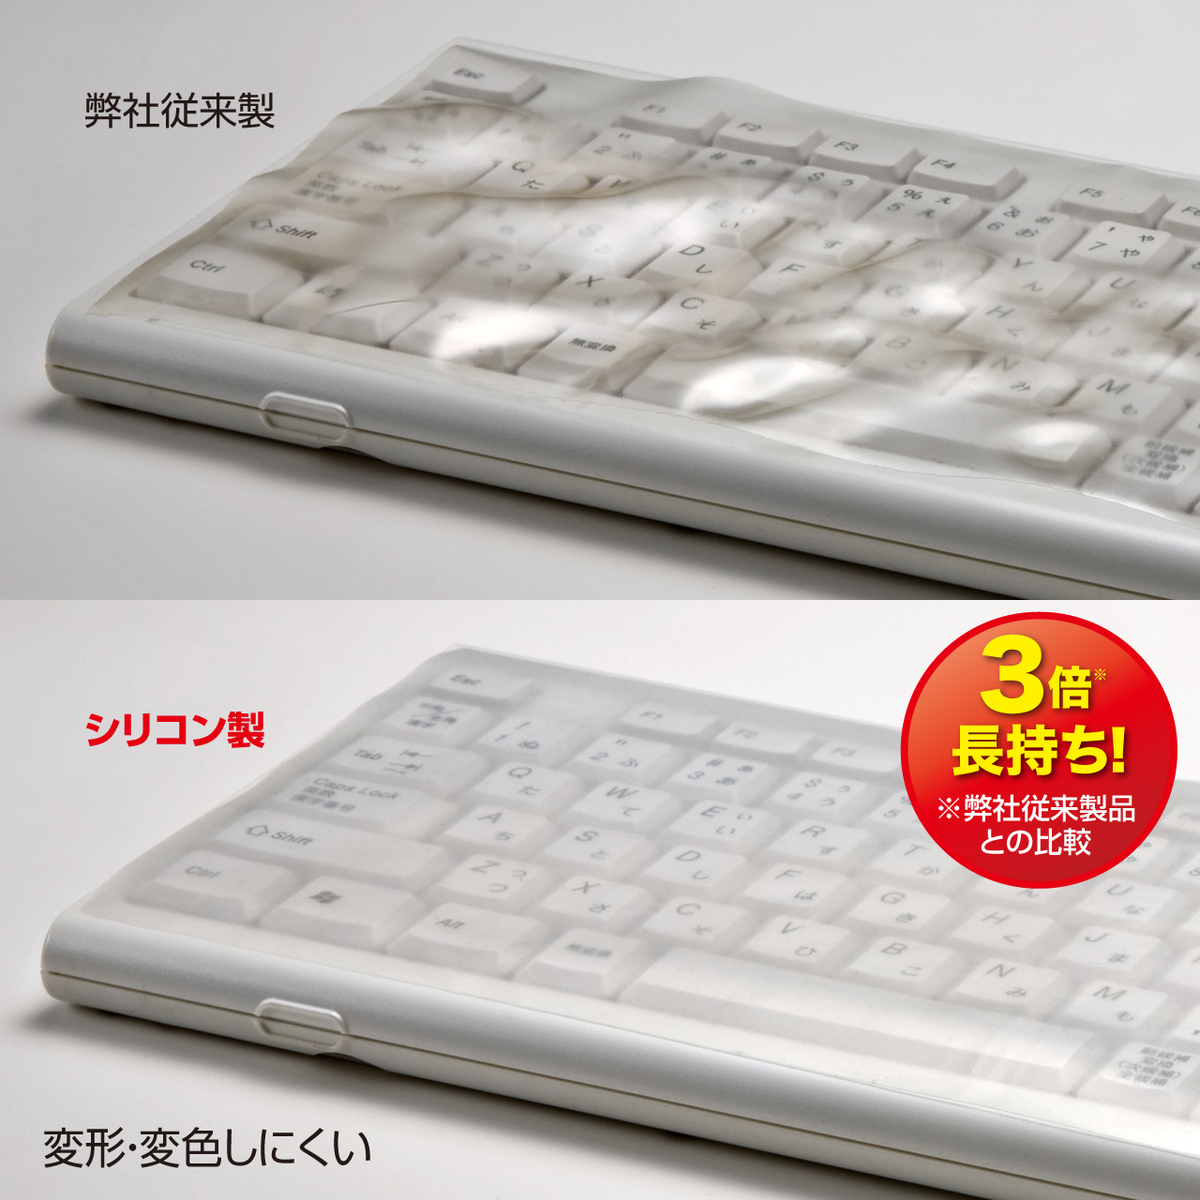 [FA-SMULTI2] キーボードマルチカバー(シートタイプ)